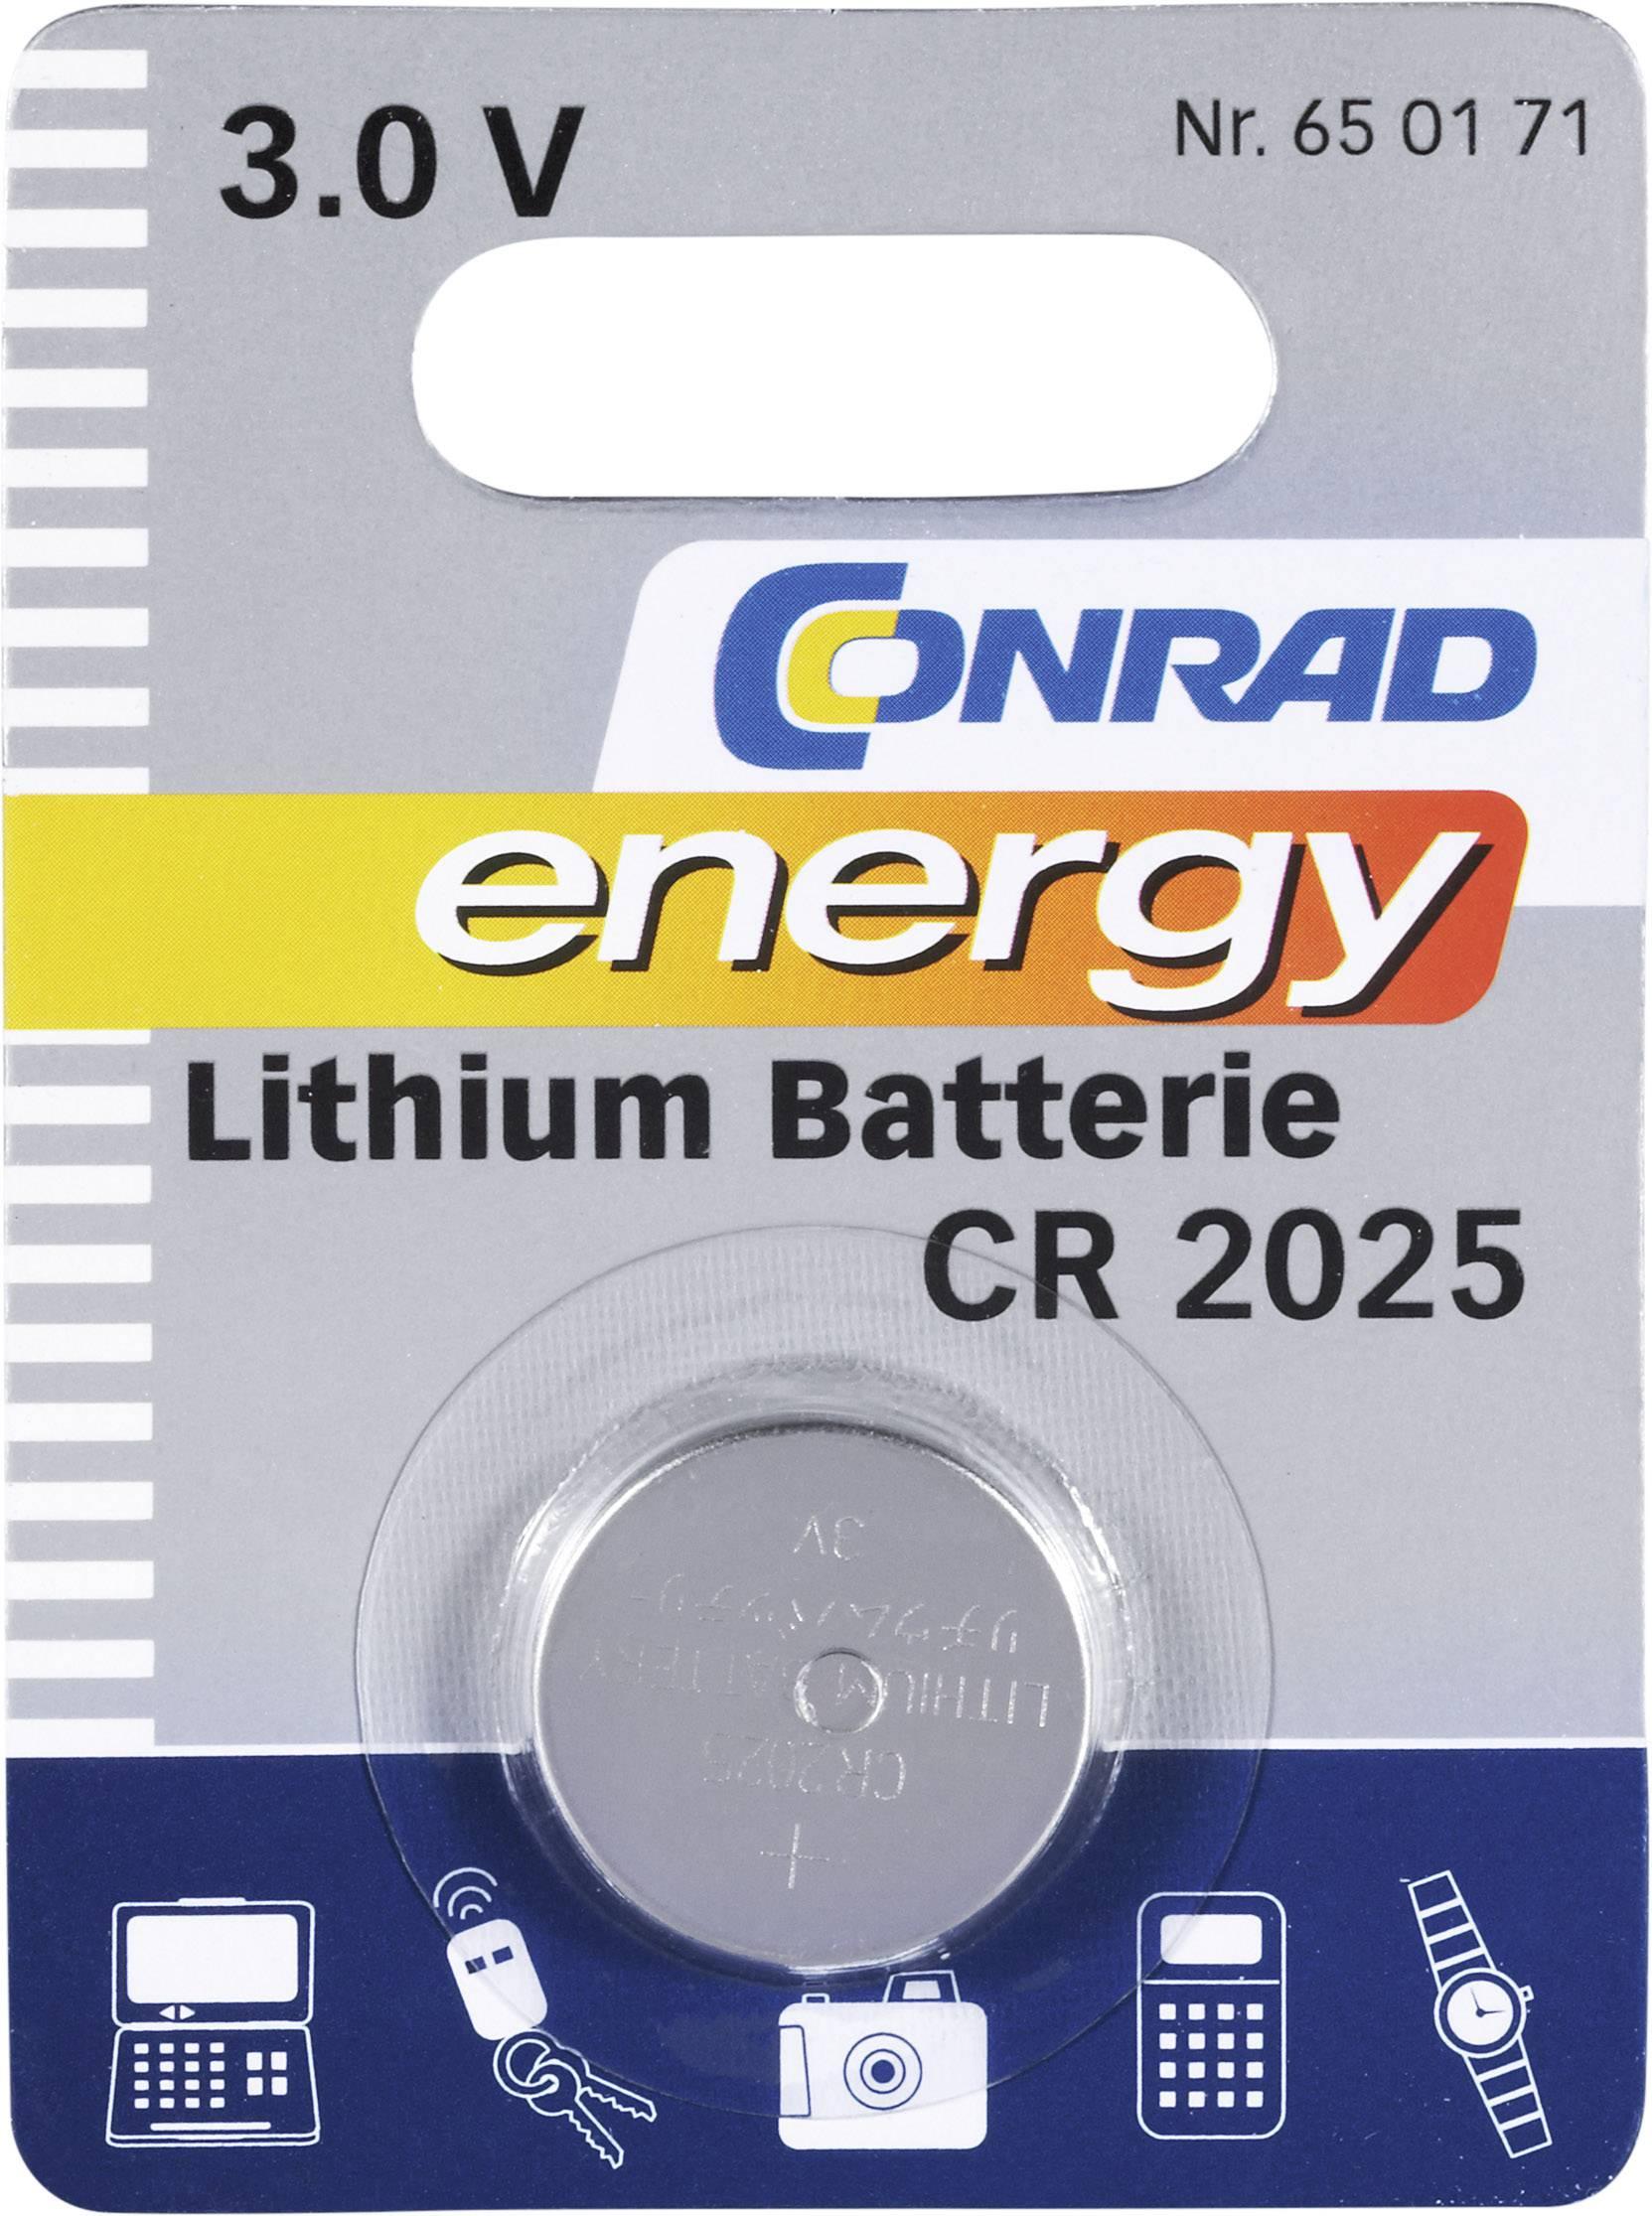 Lítiové gombíkové batérie CR 2025